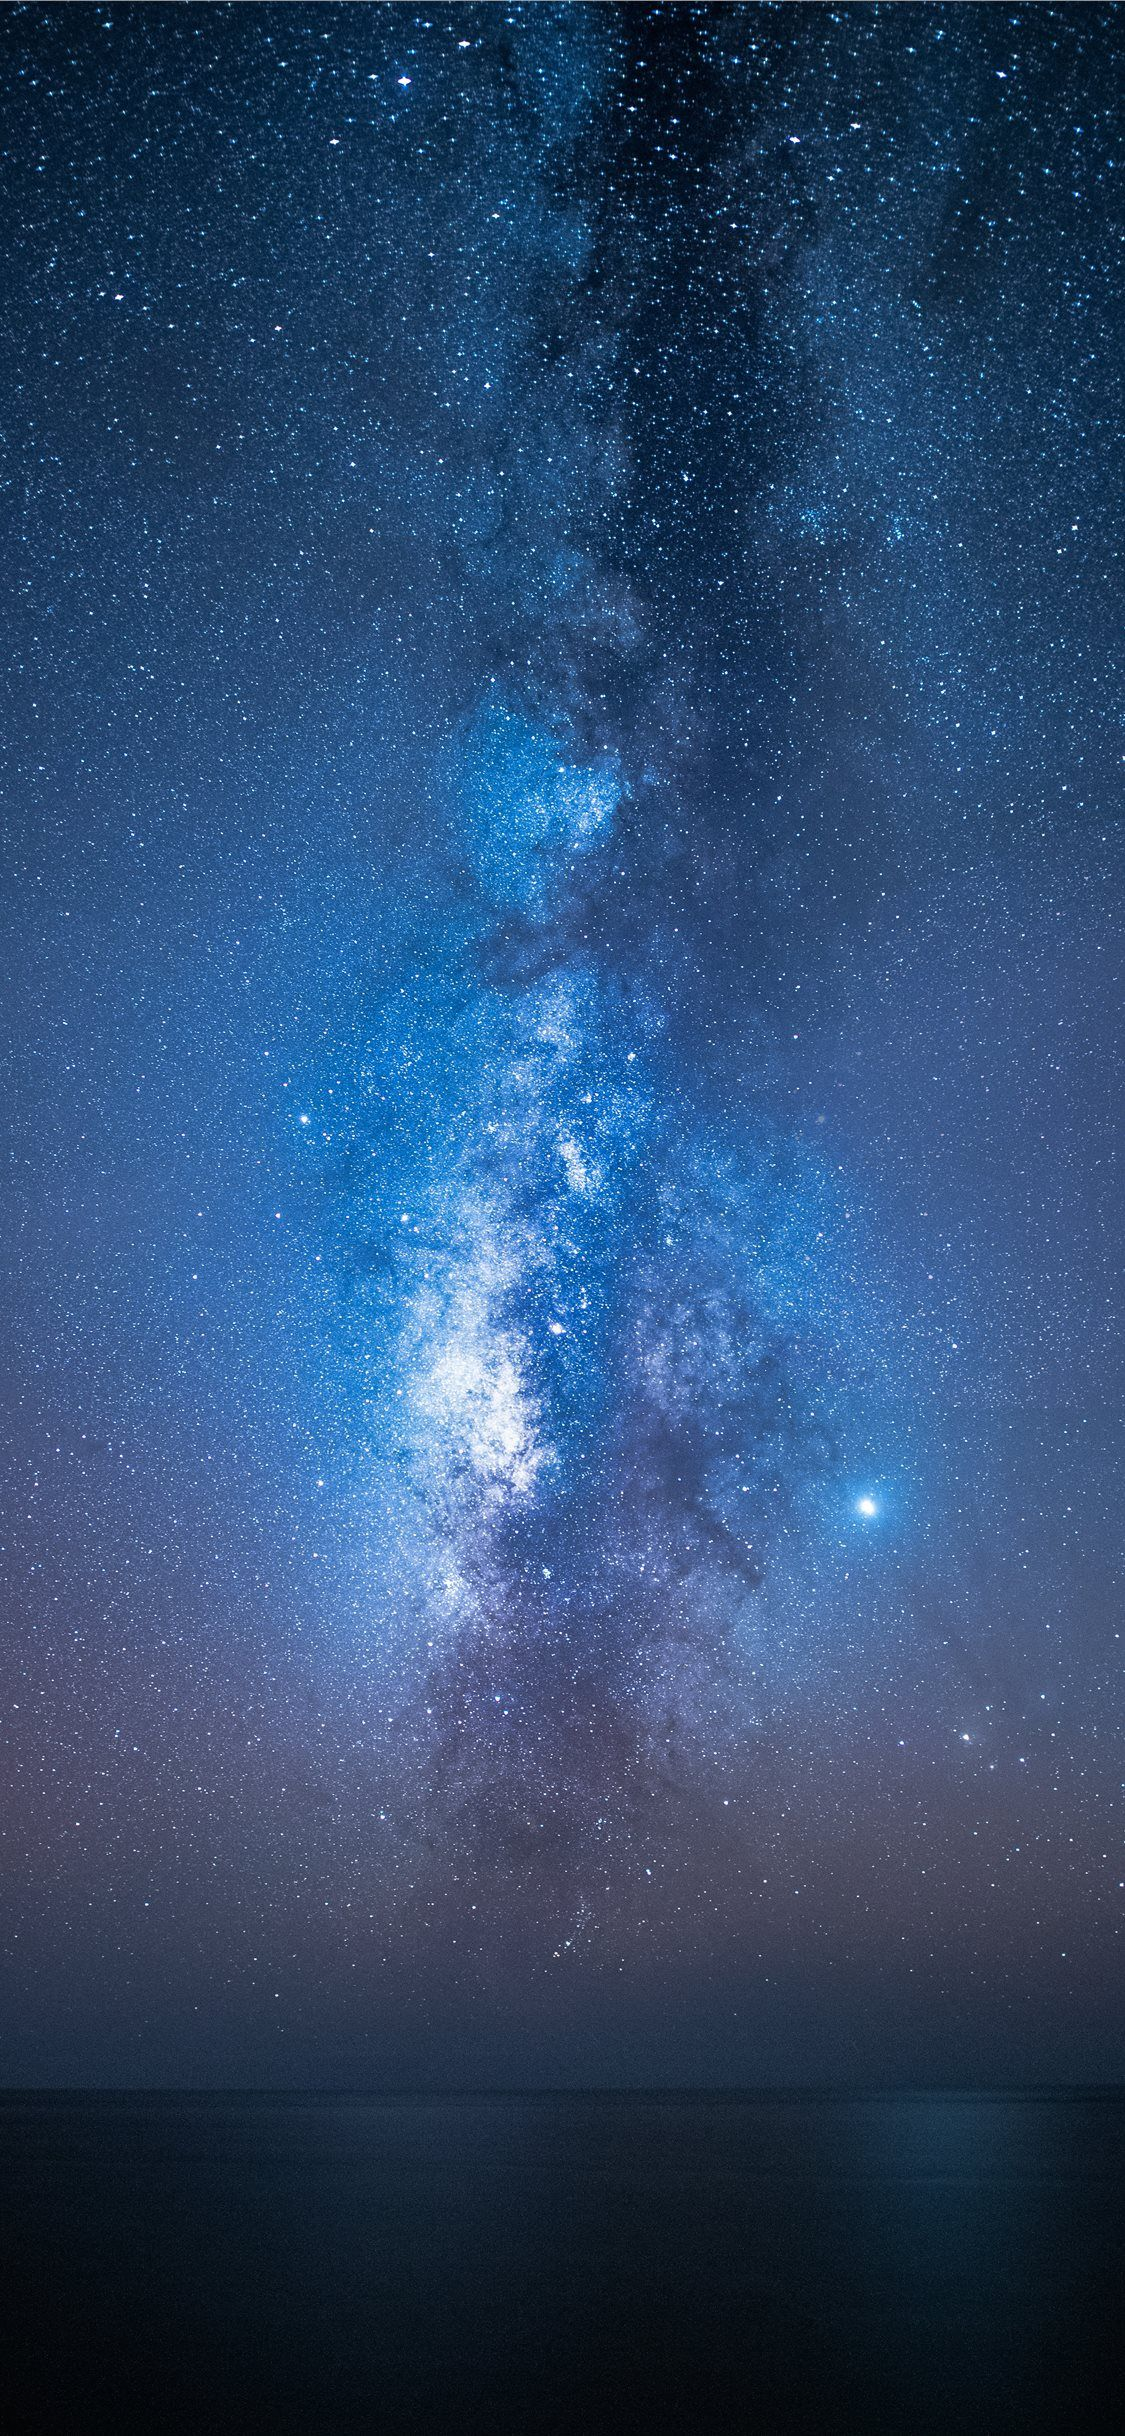 View Of Milkyway Night Sky Wallpaper Galaxy Wallpaper Scenery Wallpaper